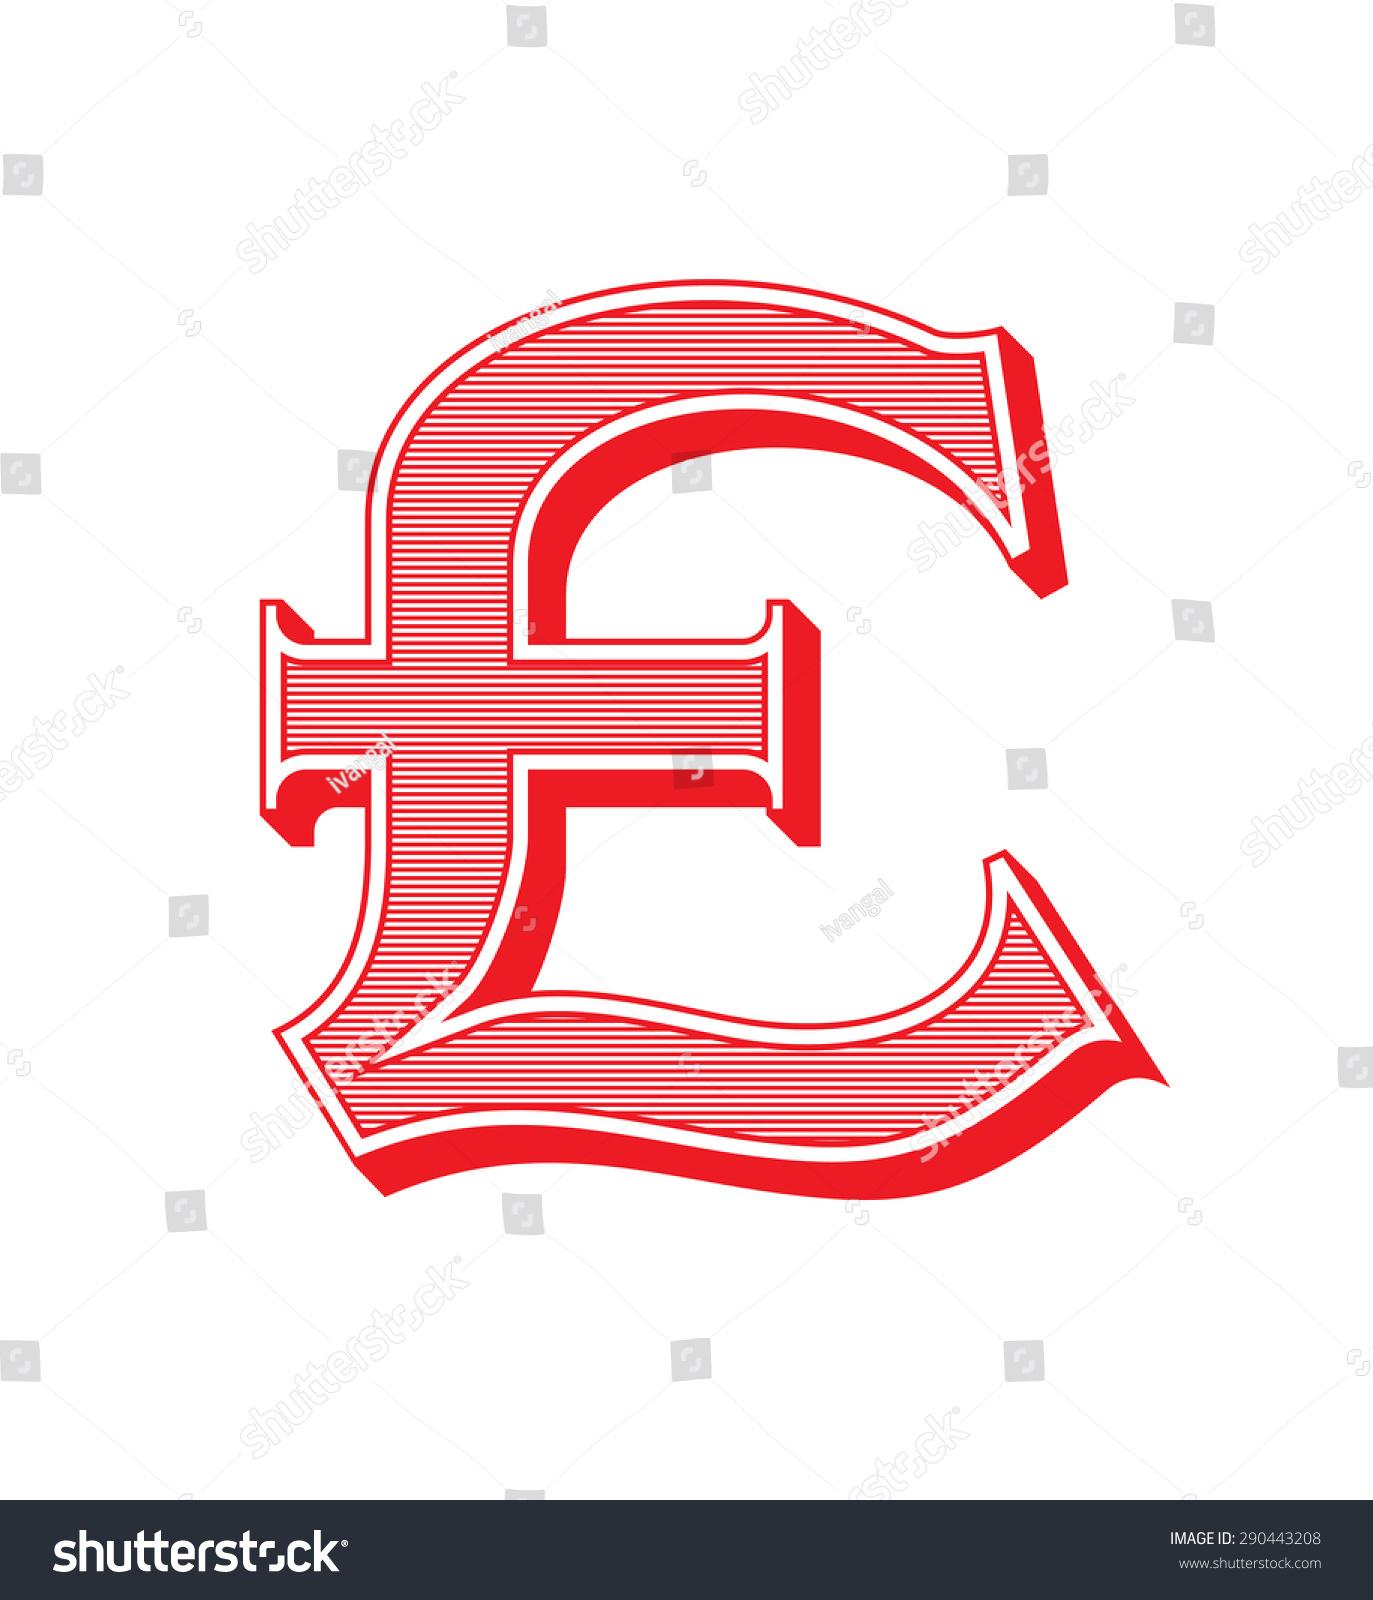 Pound sign icon gbp currency symbol stock vector 290443208 pound sign icon gbp currency symbol in vintage style buycottarizona Choice Image